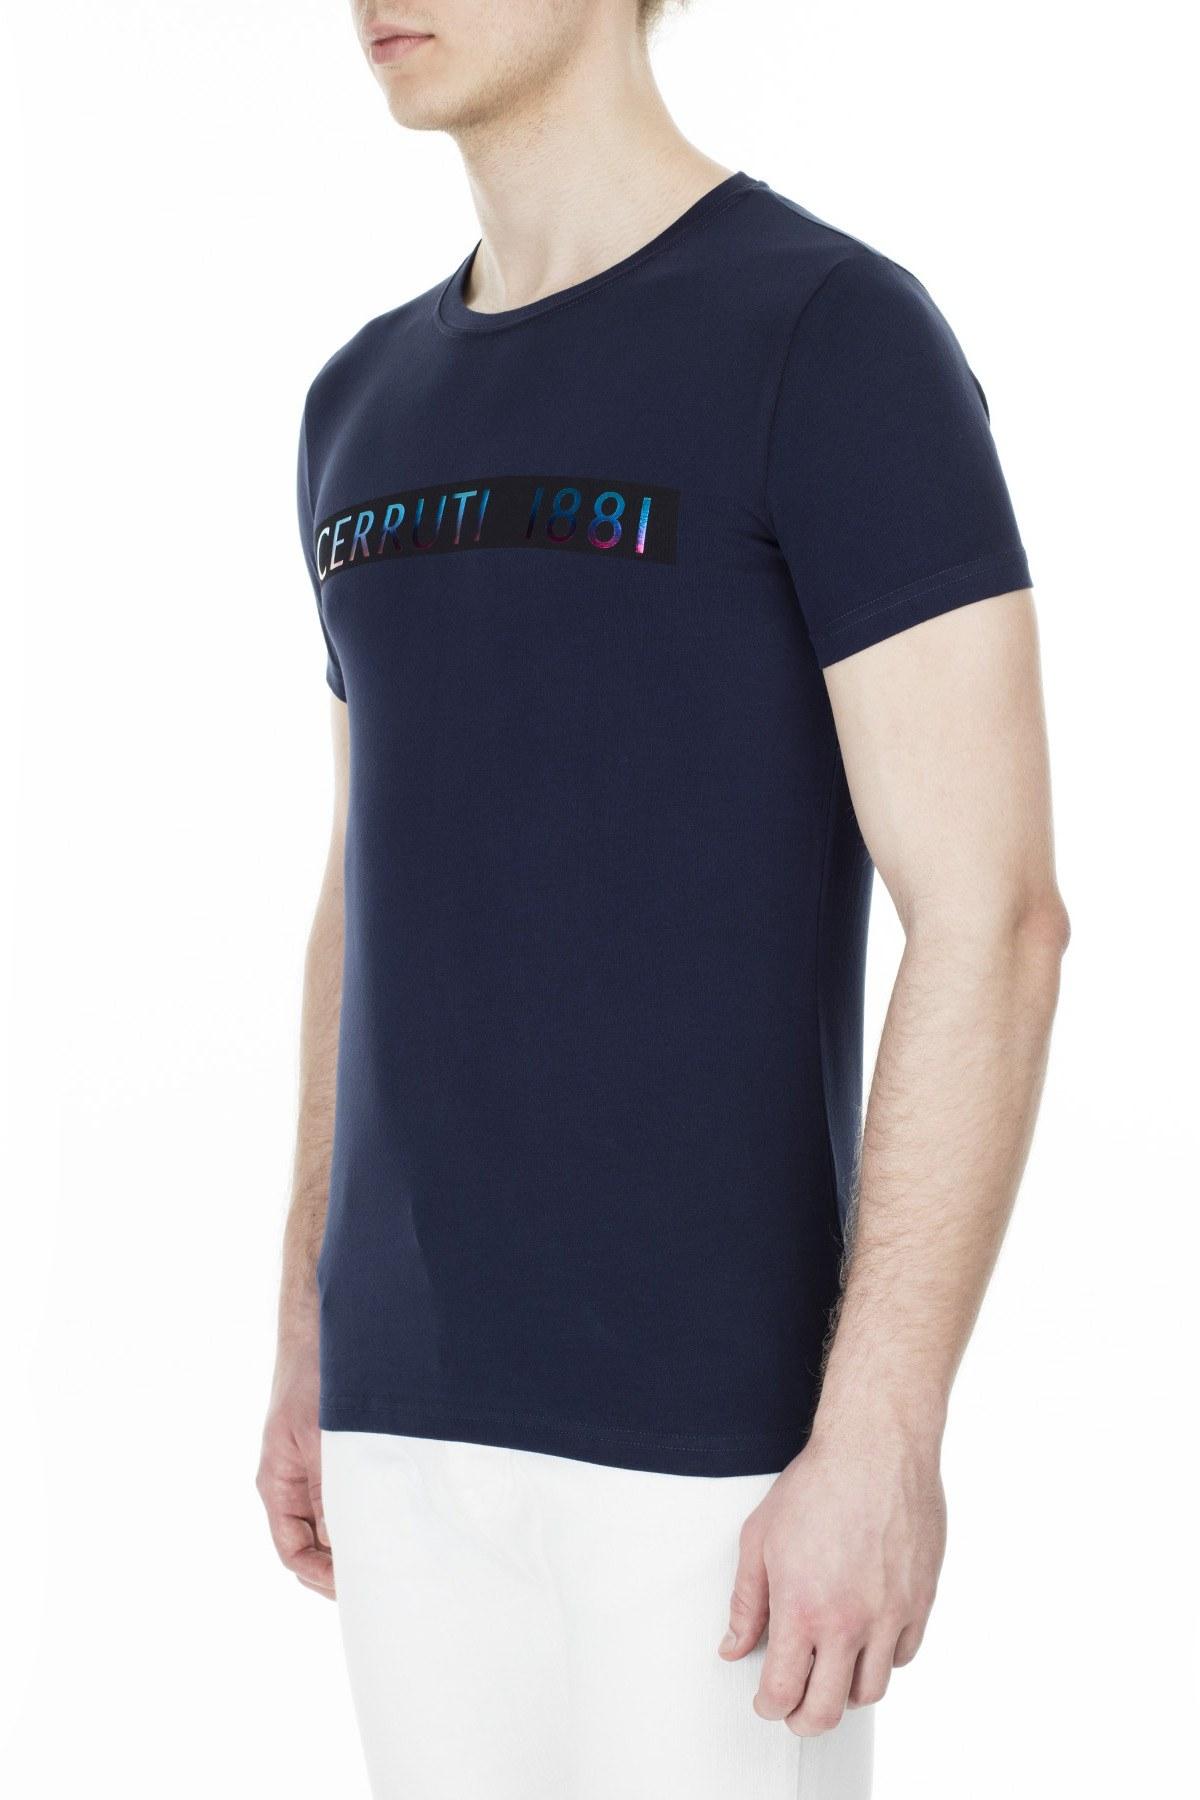 Cerruti 1881 Erkek T Shirt 203-001720 LACİVERT